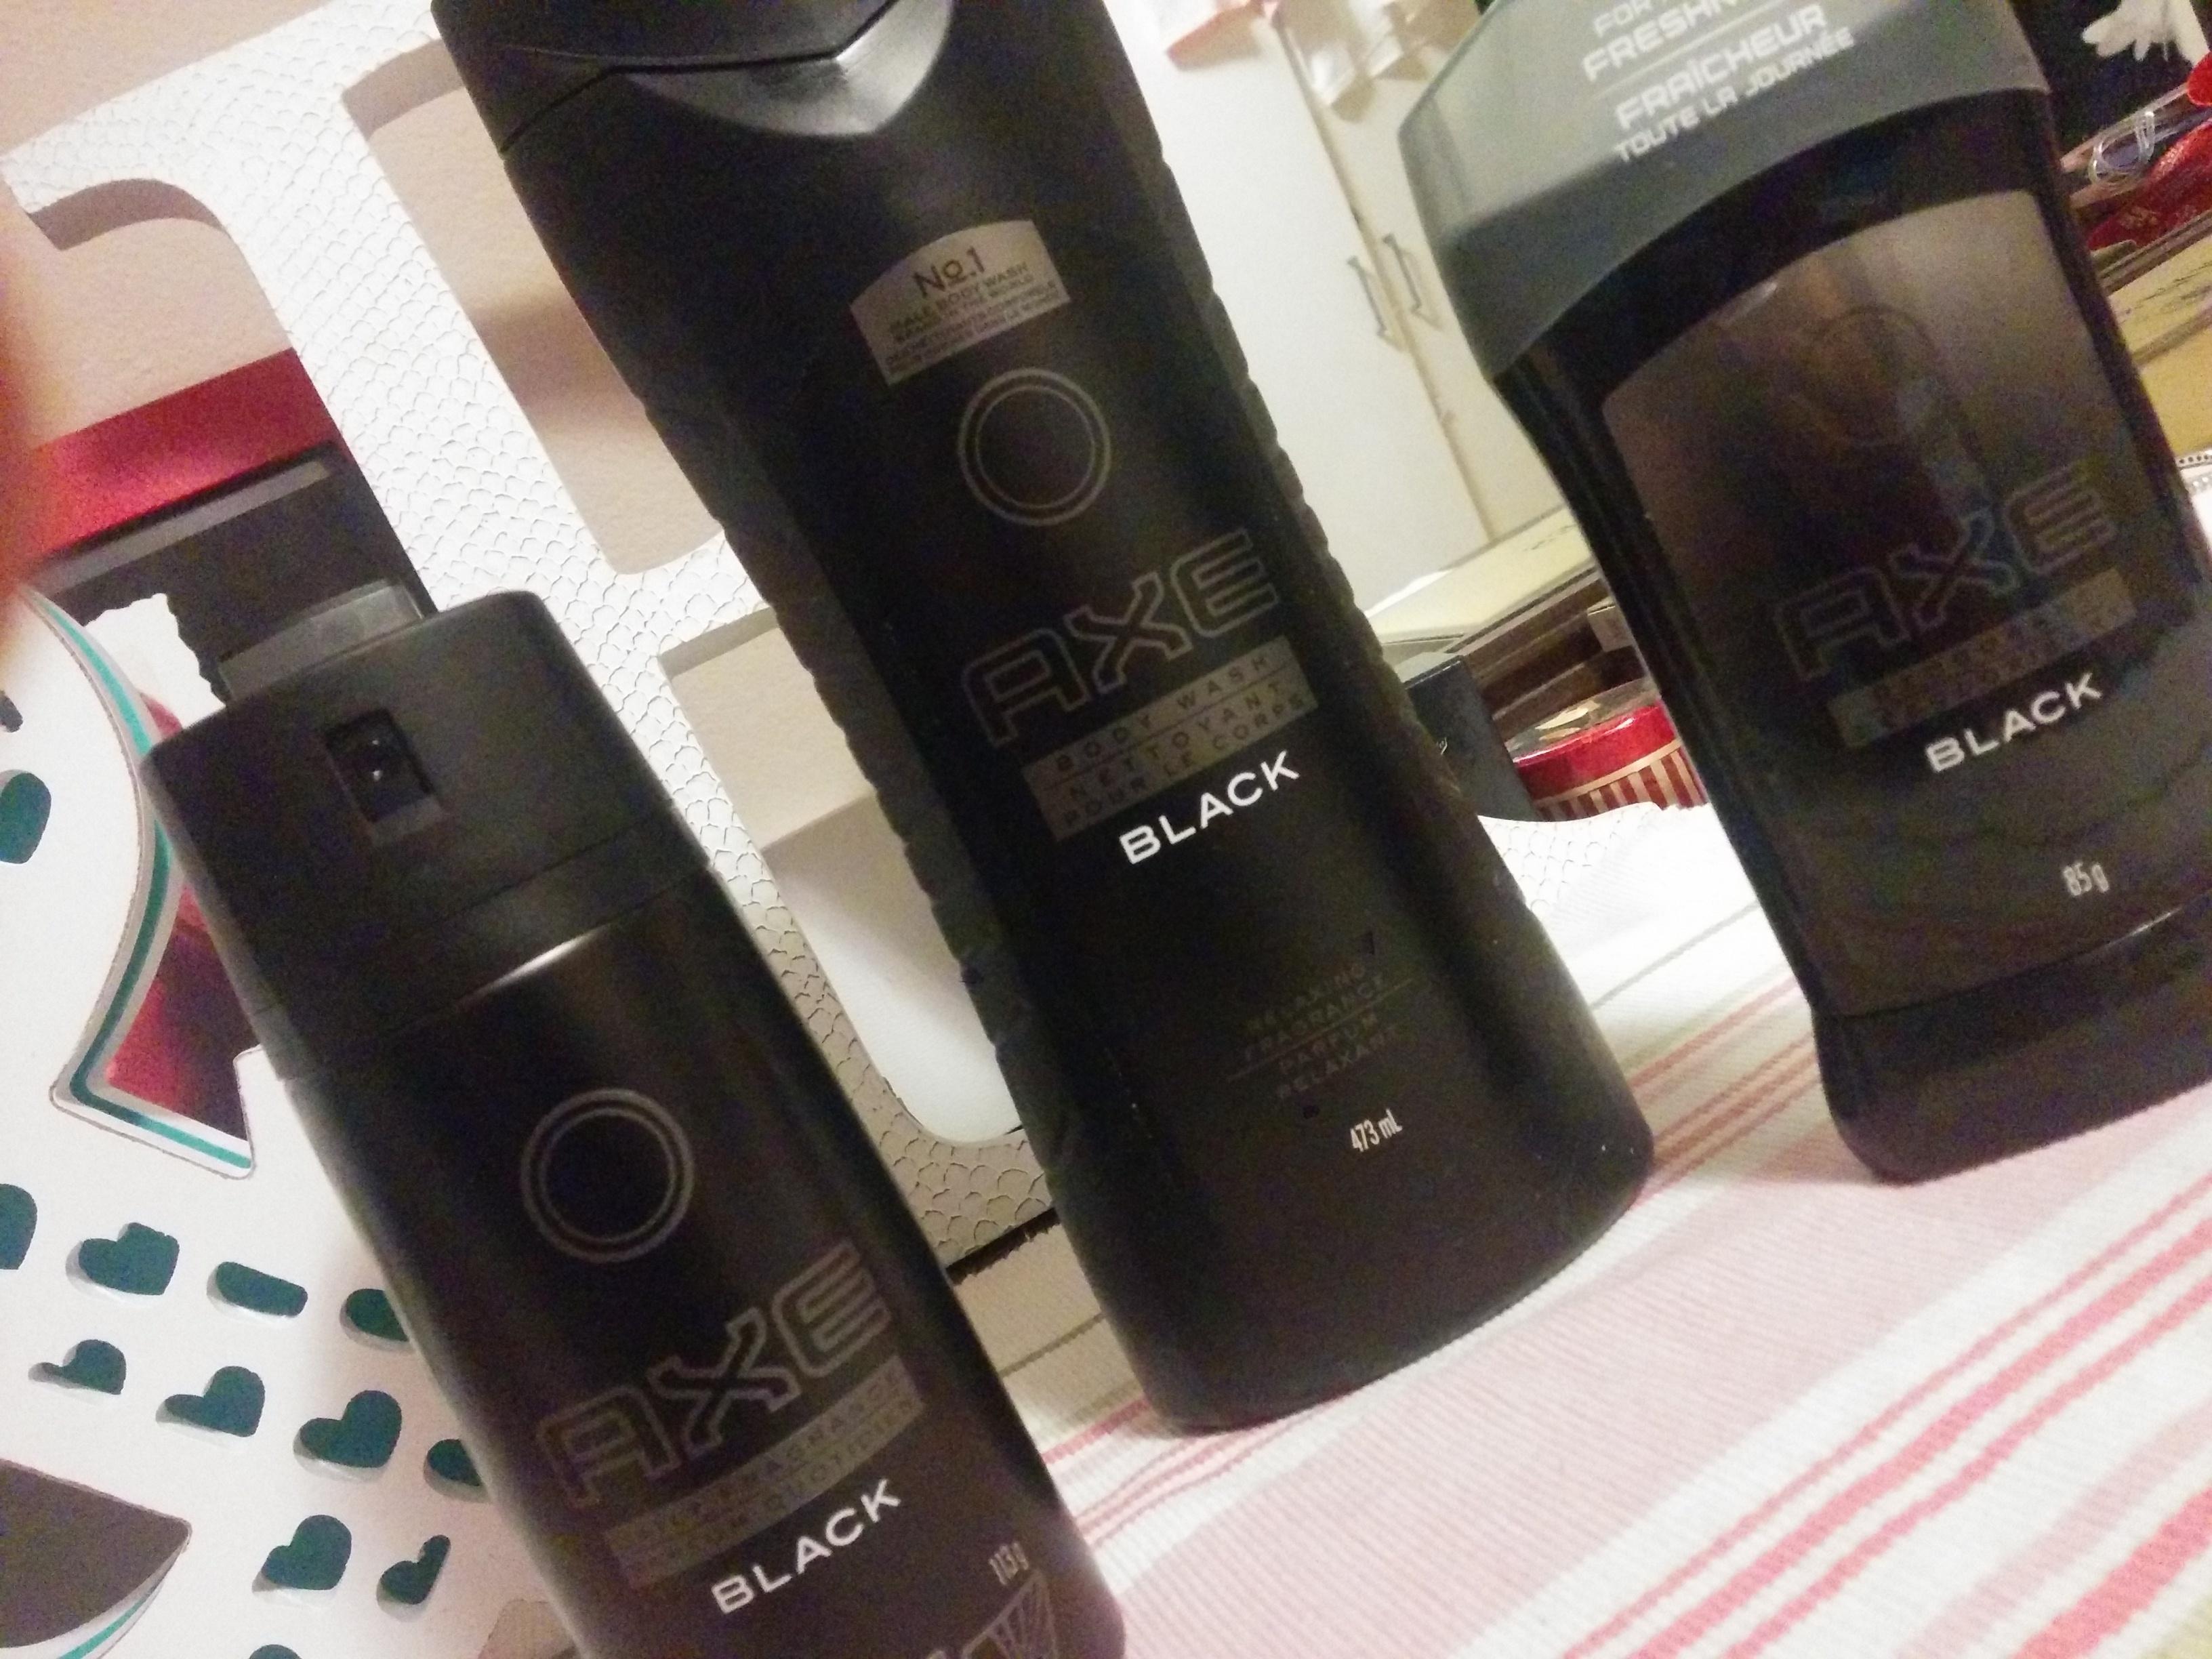 axe black body wash reviews in men u0026 39 s body wash